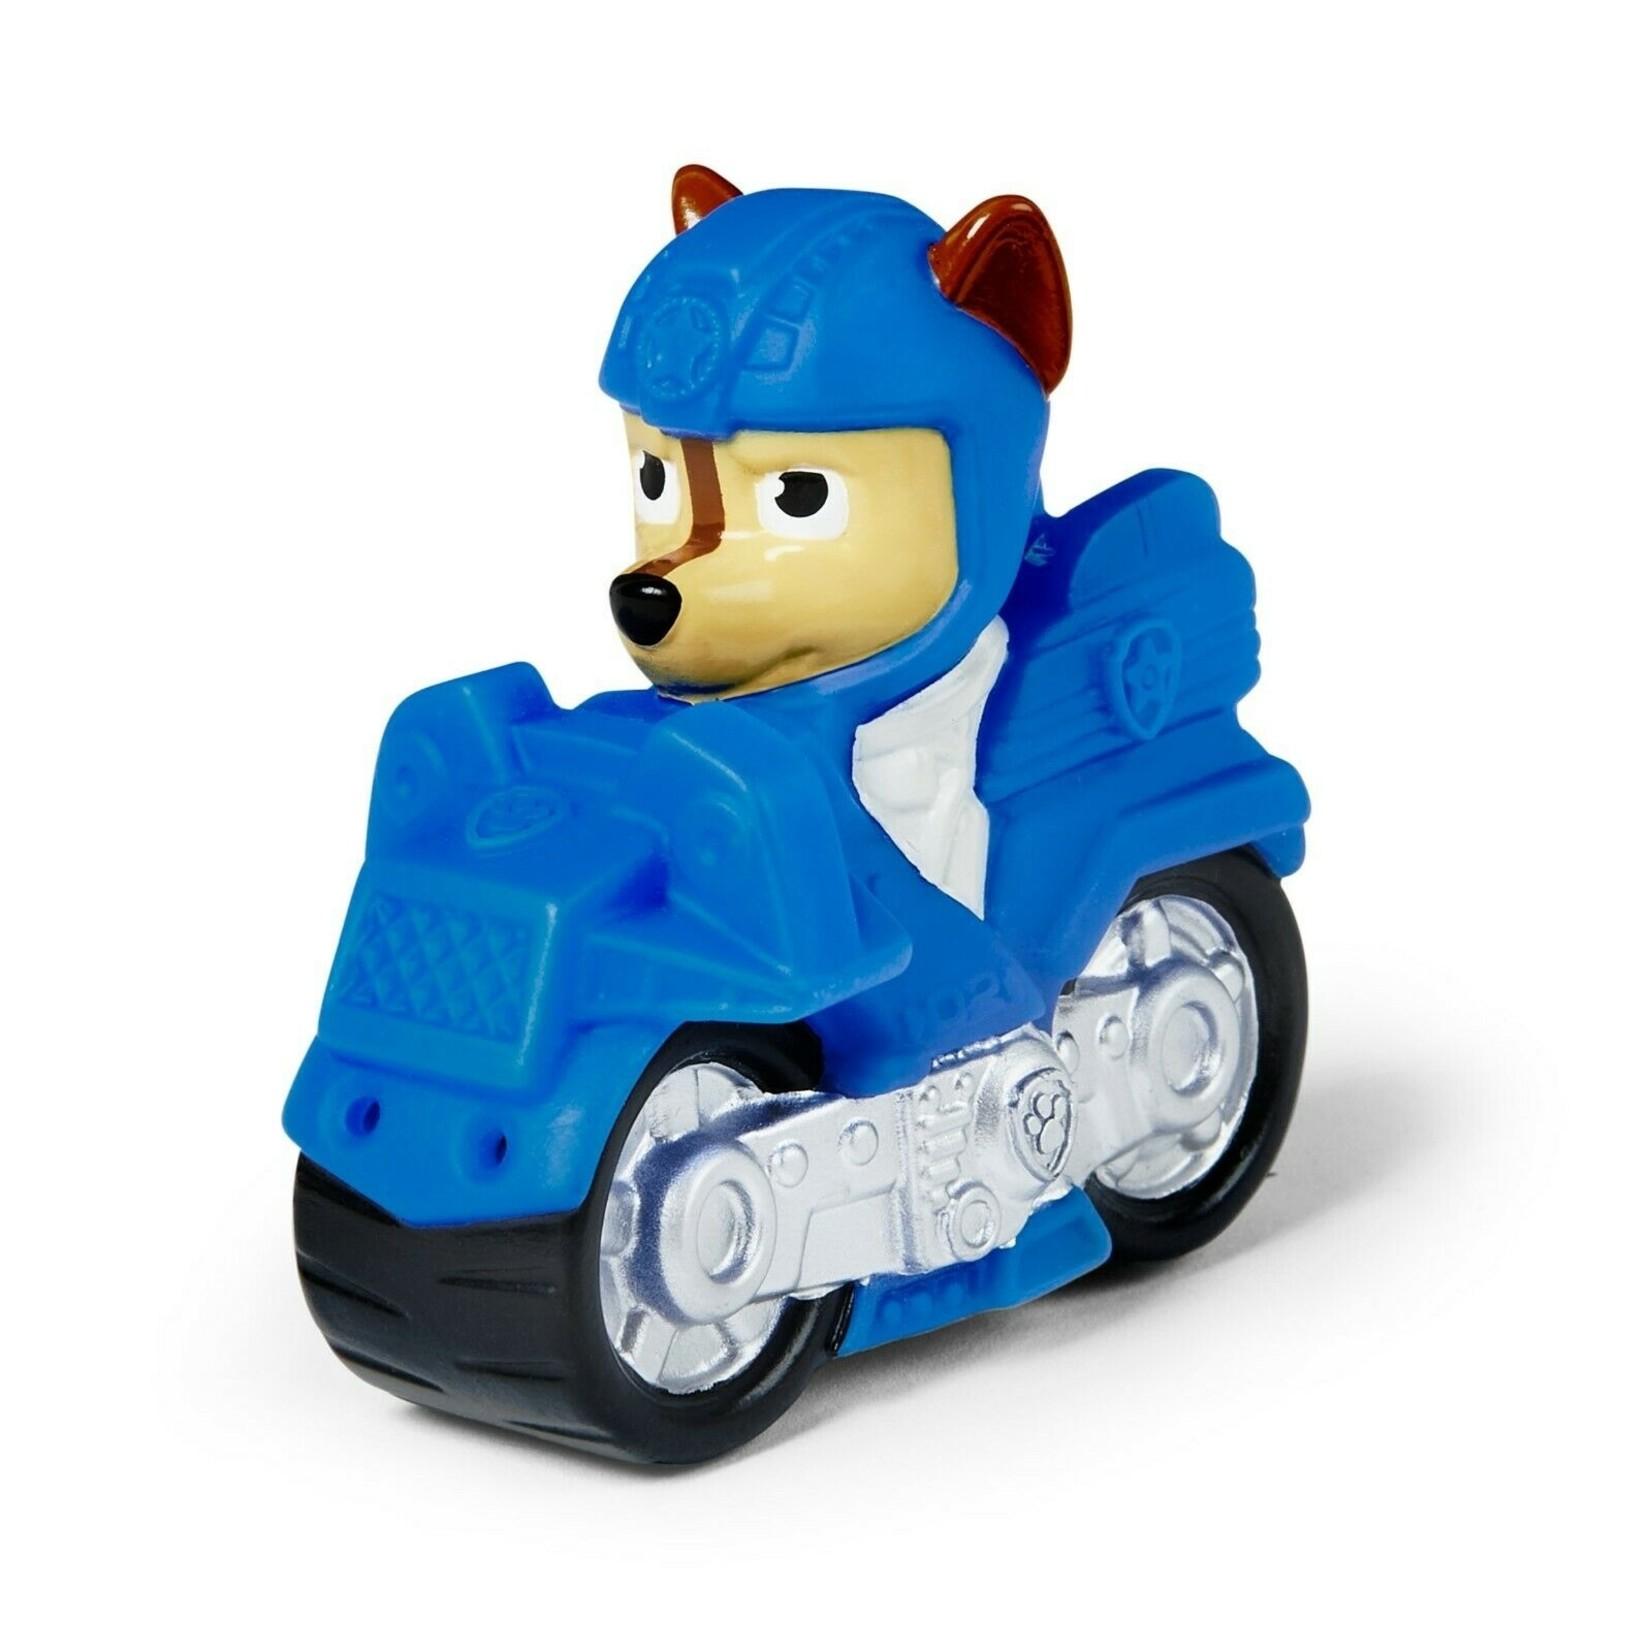 Spin Master Moto Themed Badspeeltje Chase